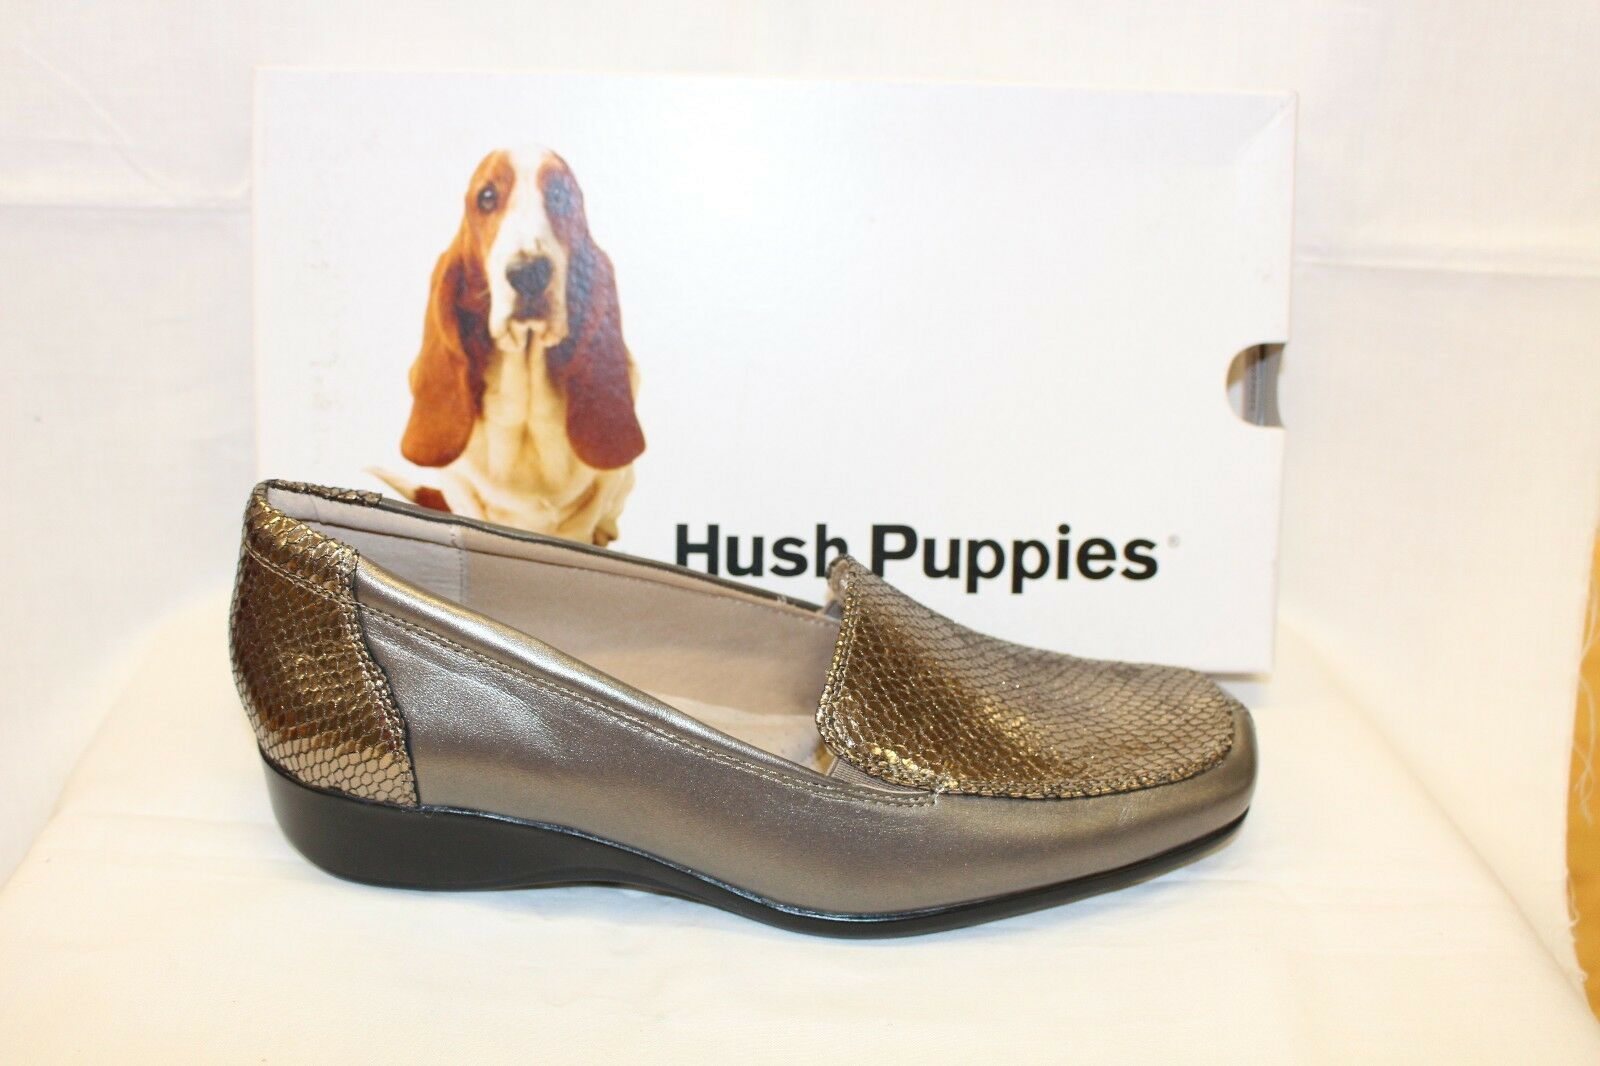 preferenziale LADIES scarpe scarpe scarpe FOOTWEAR - Hush Puppies Meadow taupe metal moccassin  benvenuto a comprare